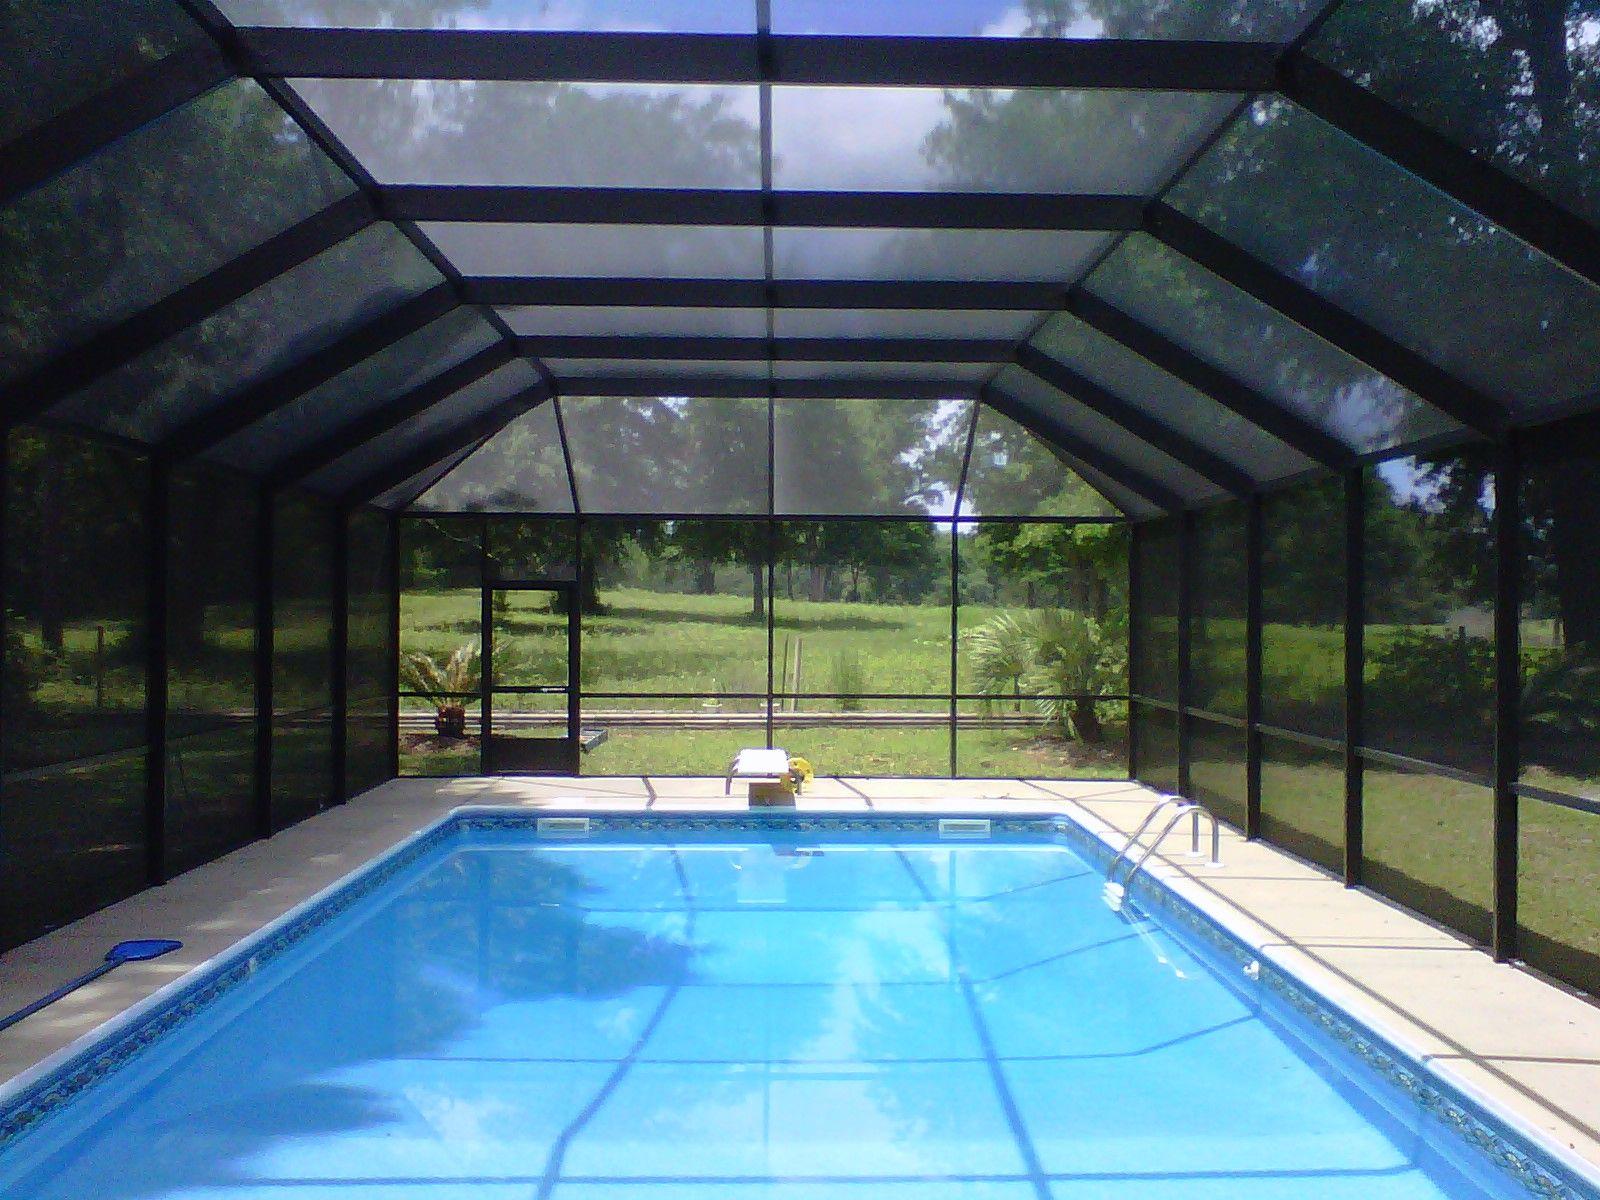 Crawfordville Florida Pool Enclosure Specialists Pool Enclosures